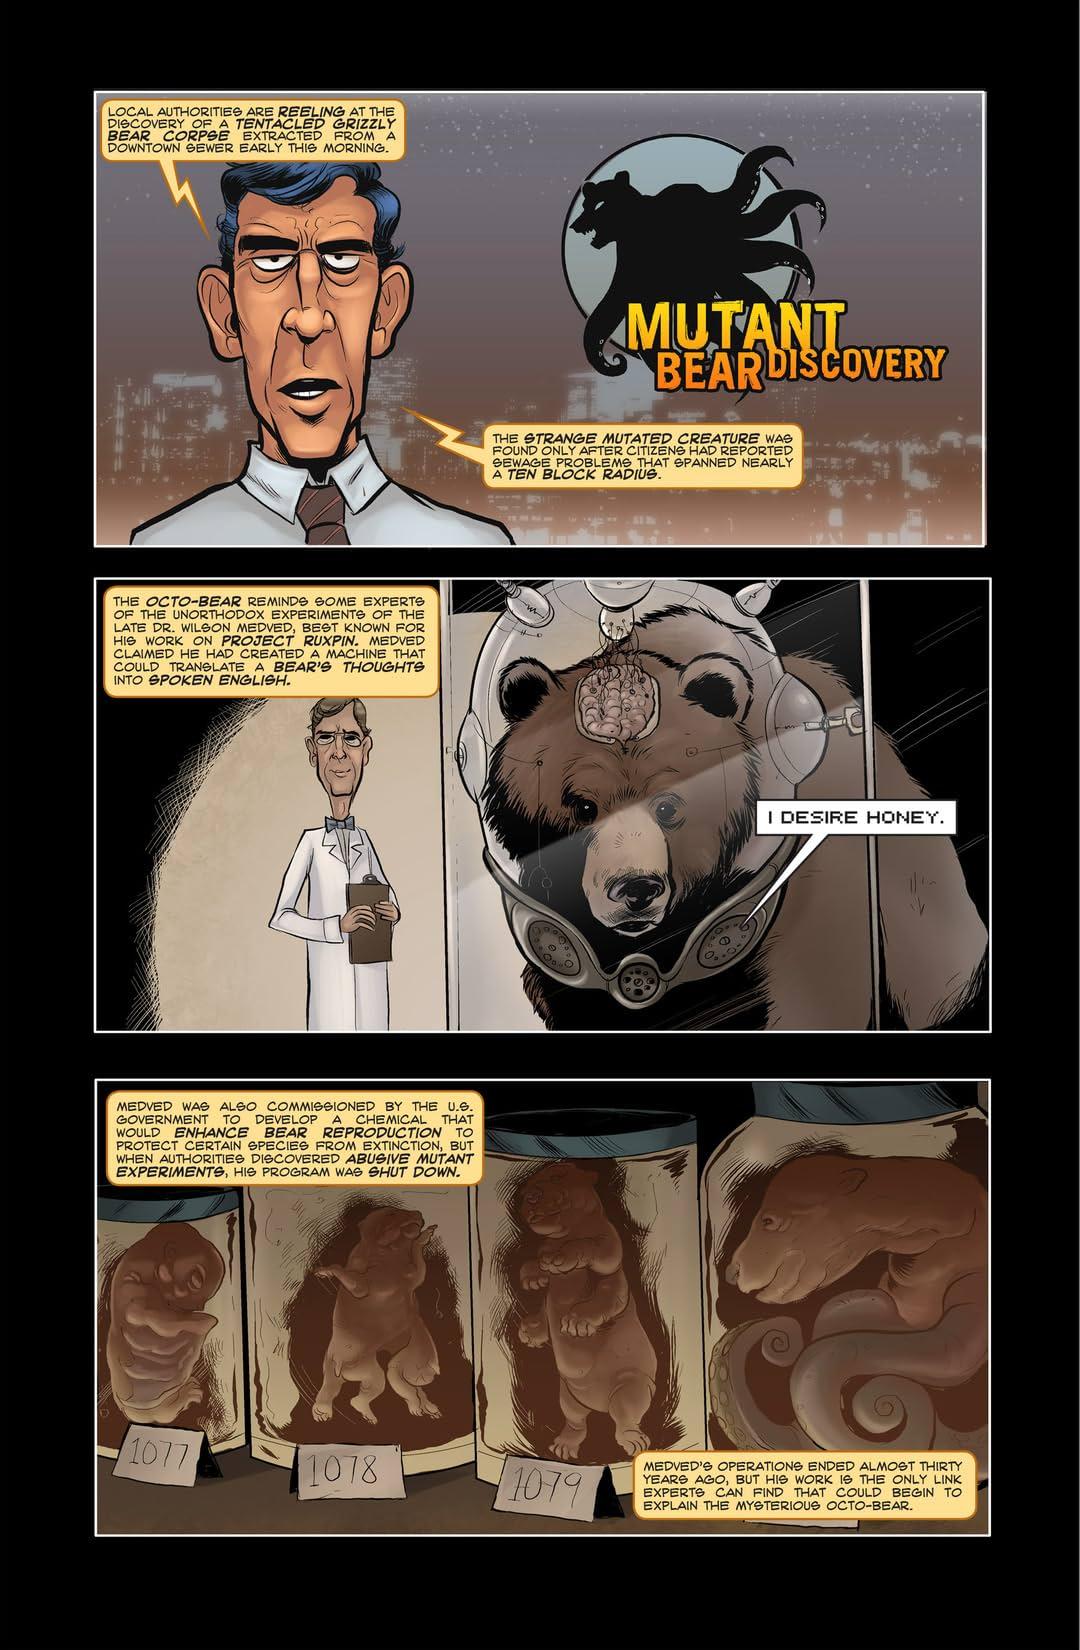 Bearmageddon Vol. 1